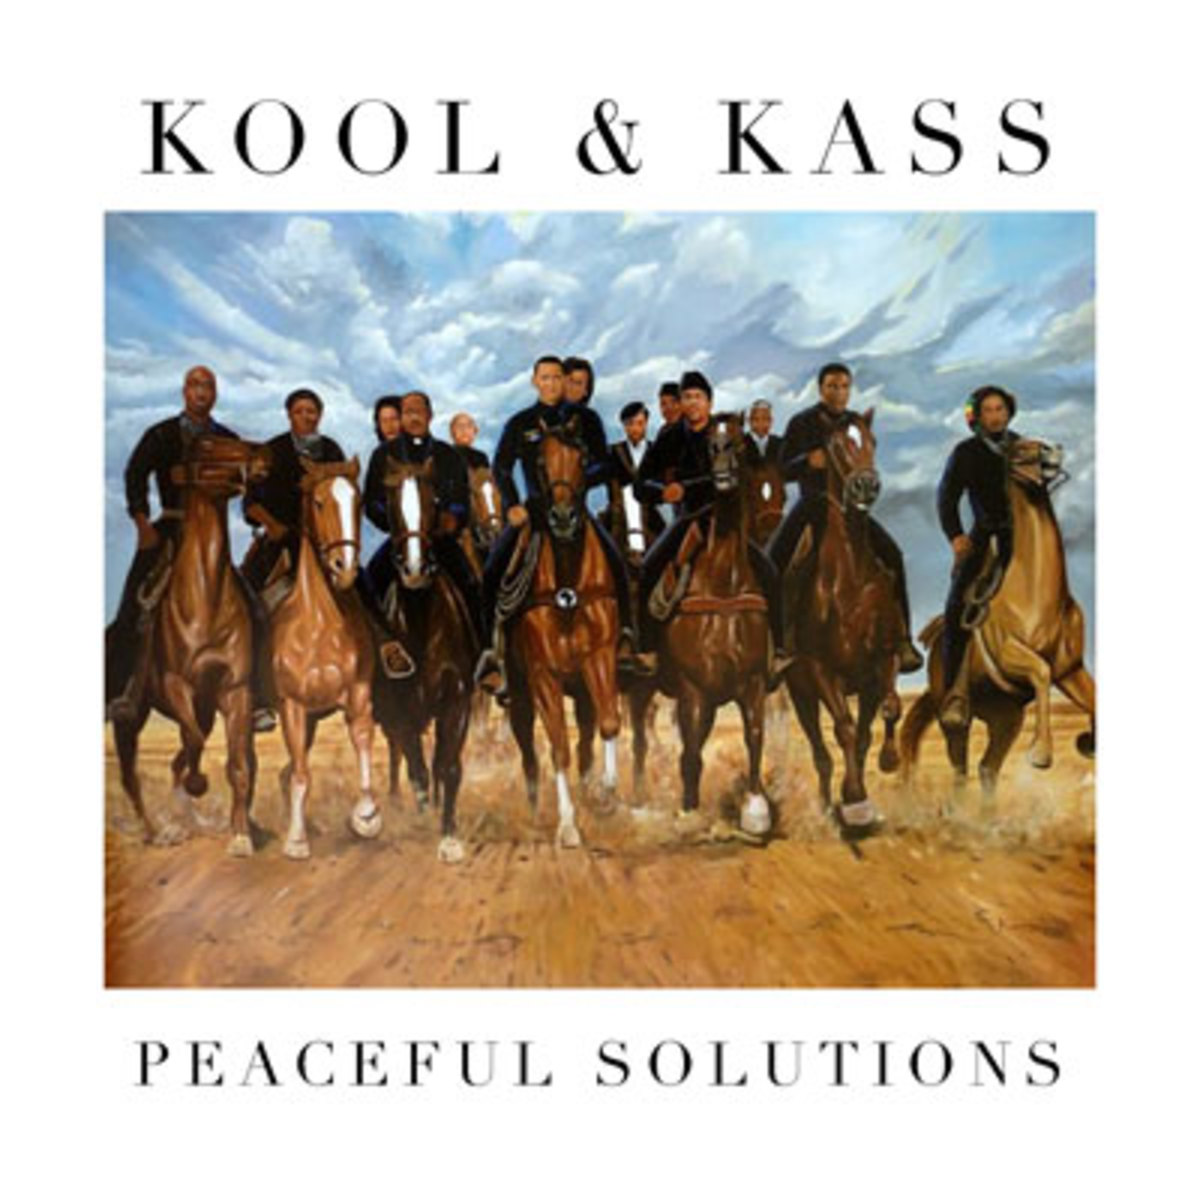 koolkass-peacefulsolutions.jpg